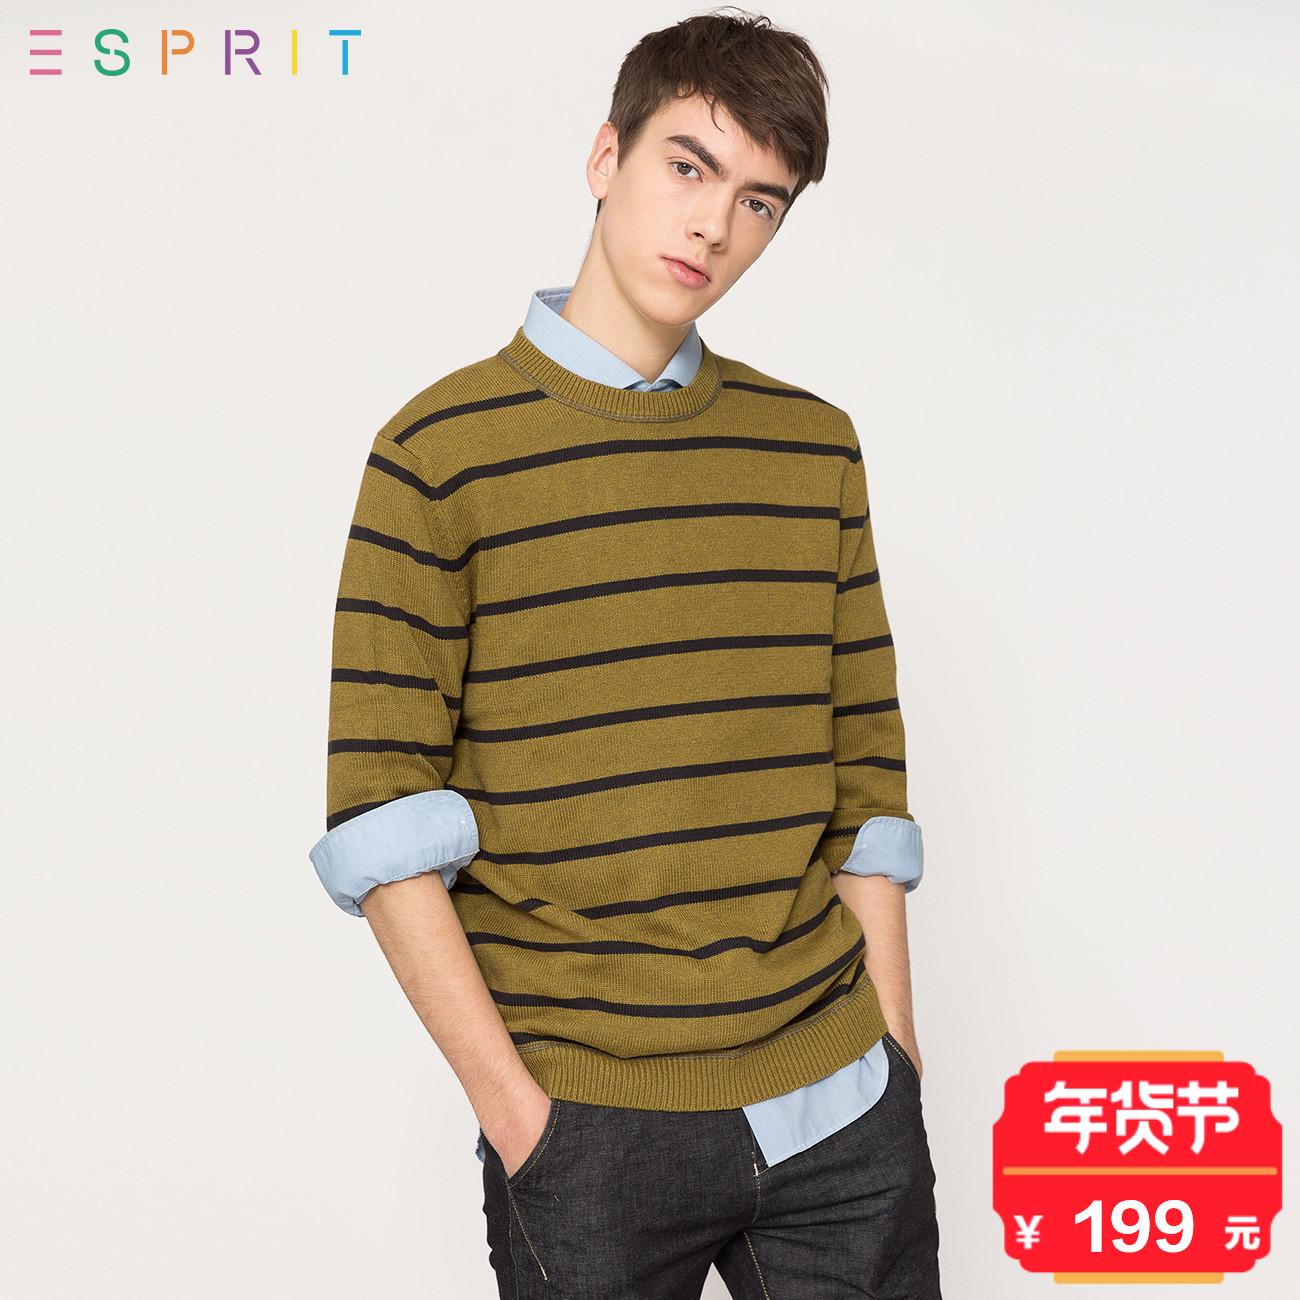 ESPRIT 男装2017冬全棉撞色条纹圆领针织套头衫-117EE2I003